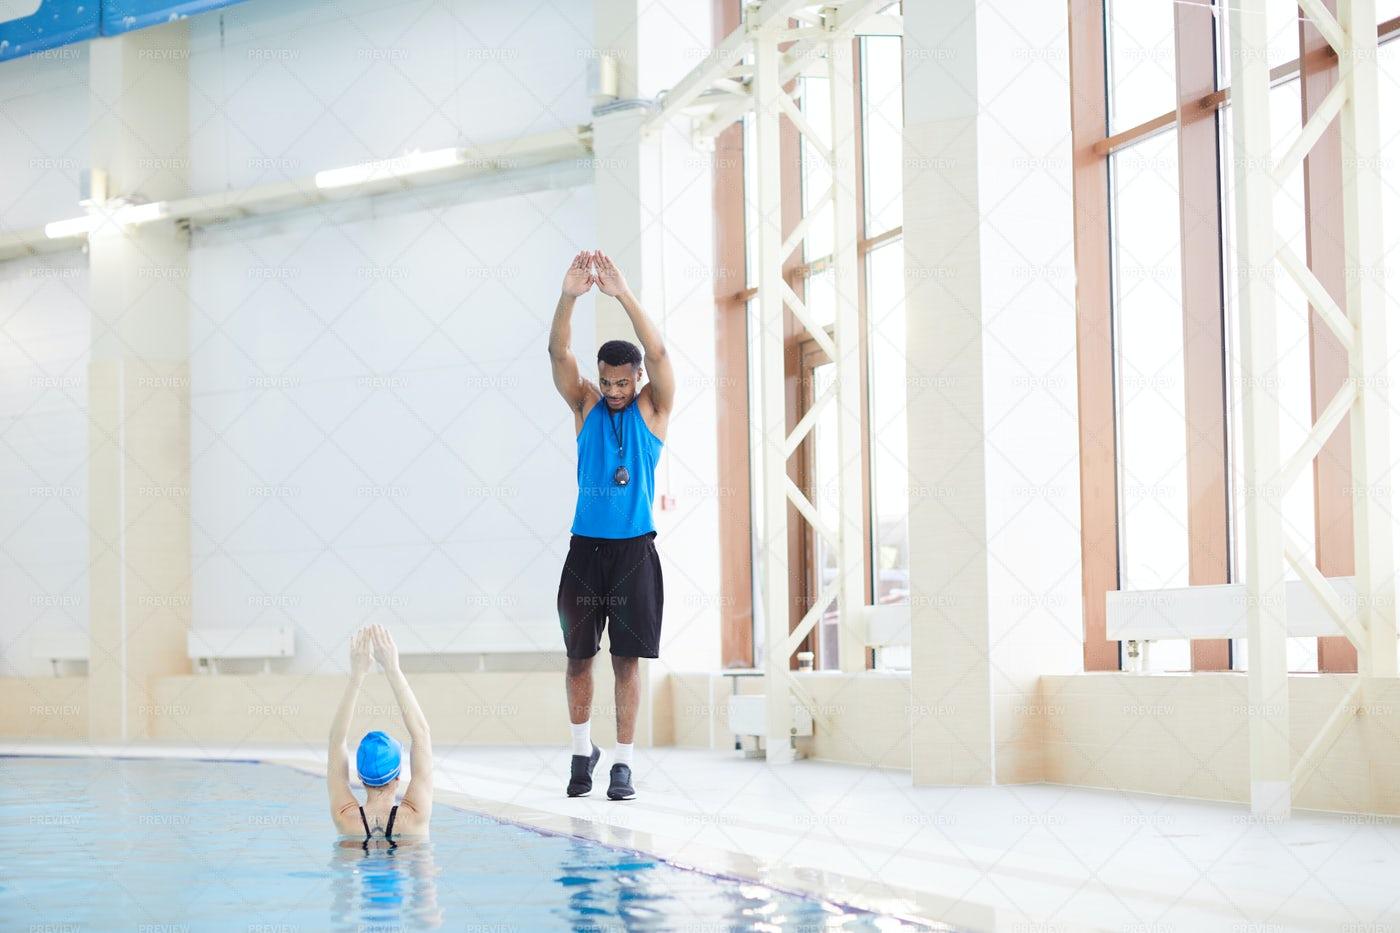 Aqua Fitness In Pool: Stock Photos